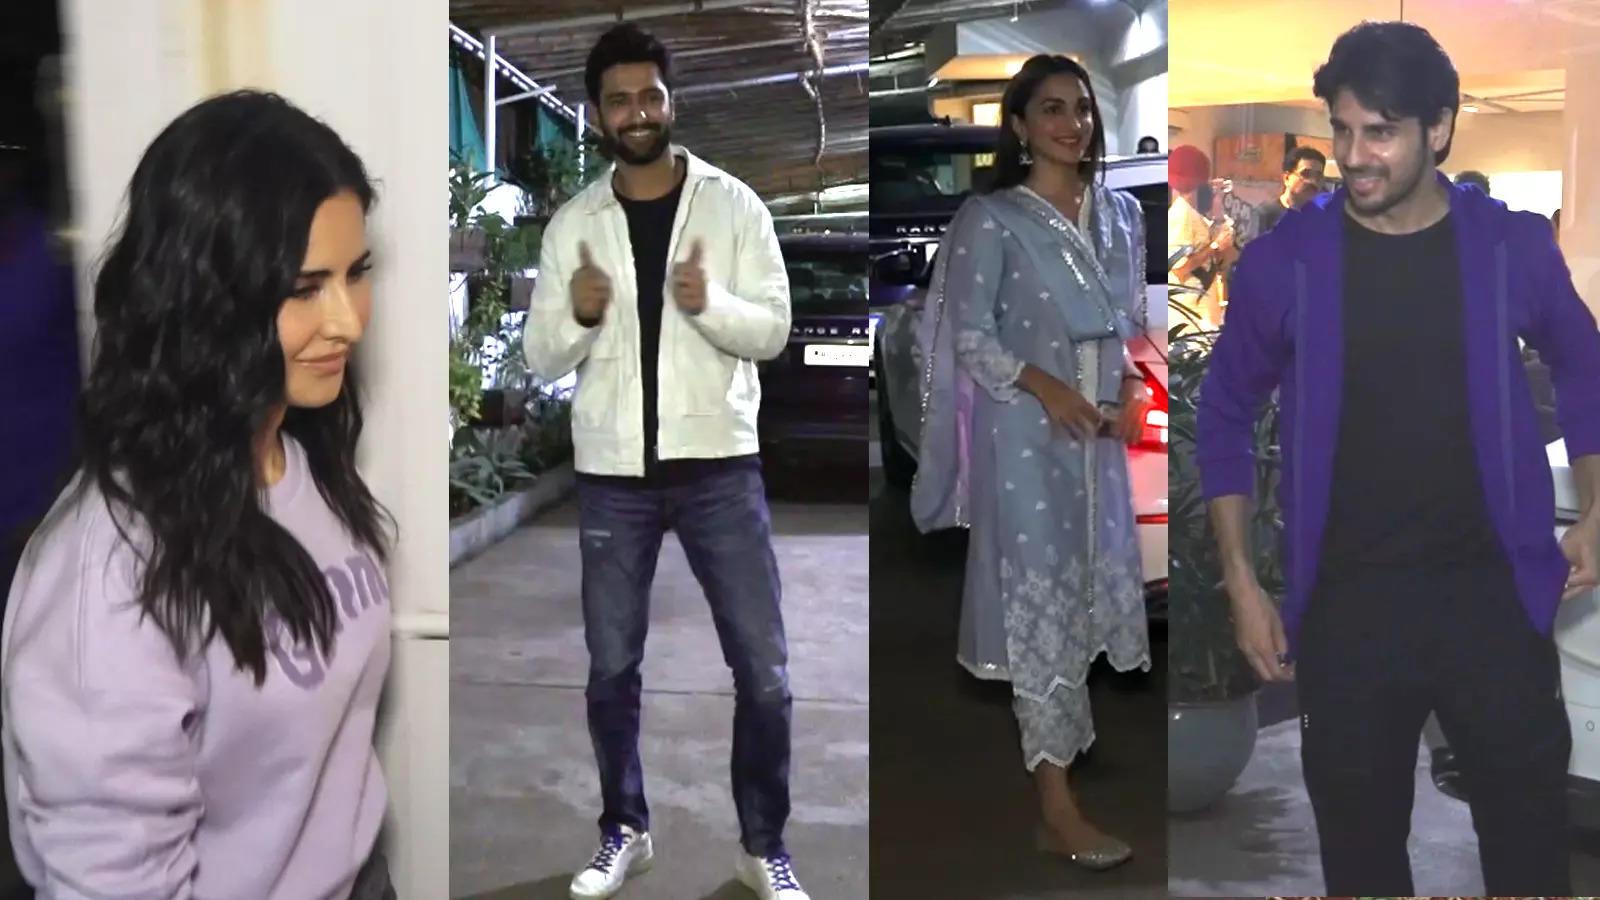 vicky-kaushal-hosts-special-screening-of-sardar-udham-katrina-kaif-sidharth-malhotra-kiara-advani-among-others-grace-the-event